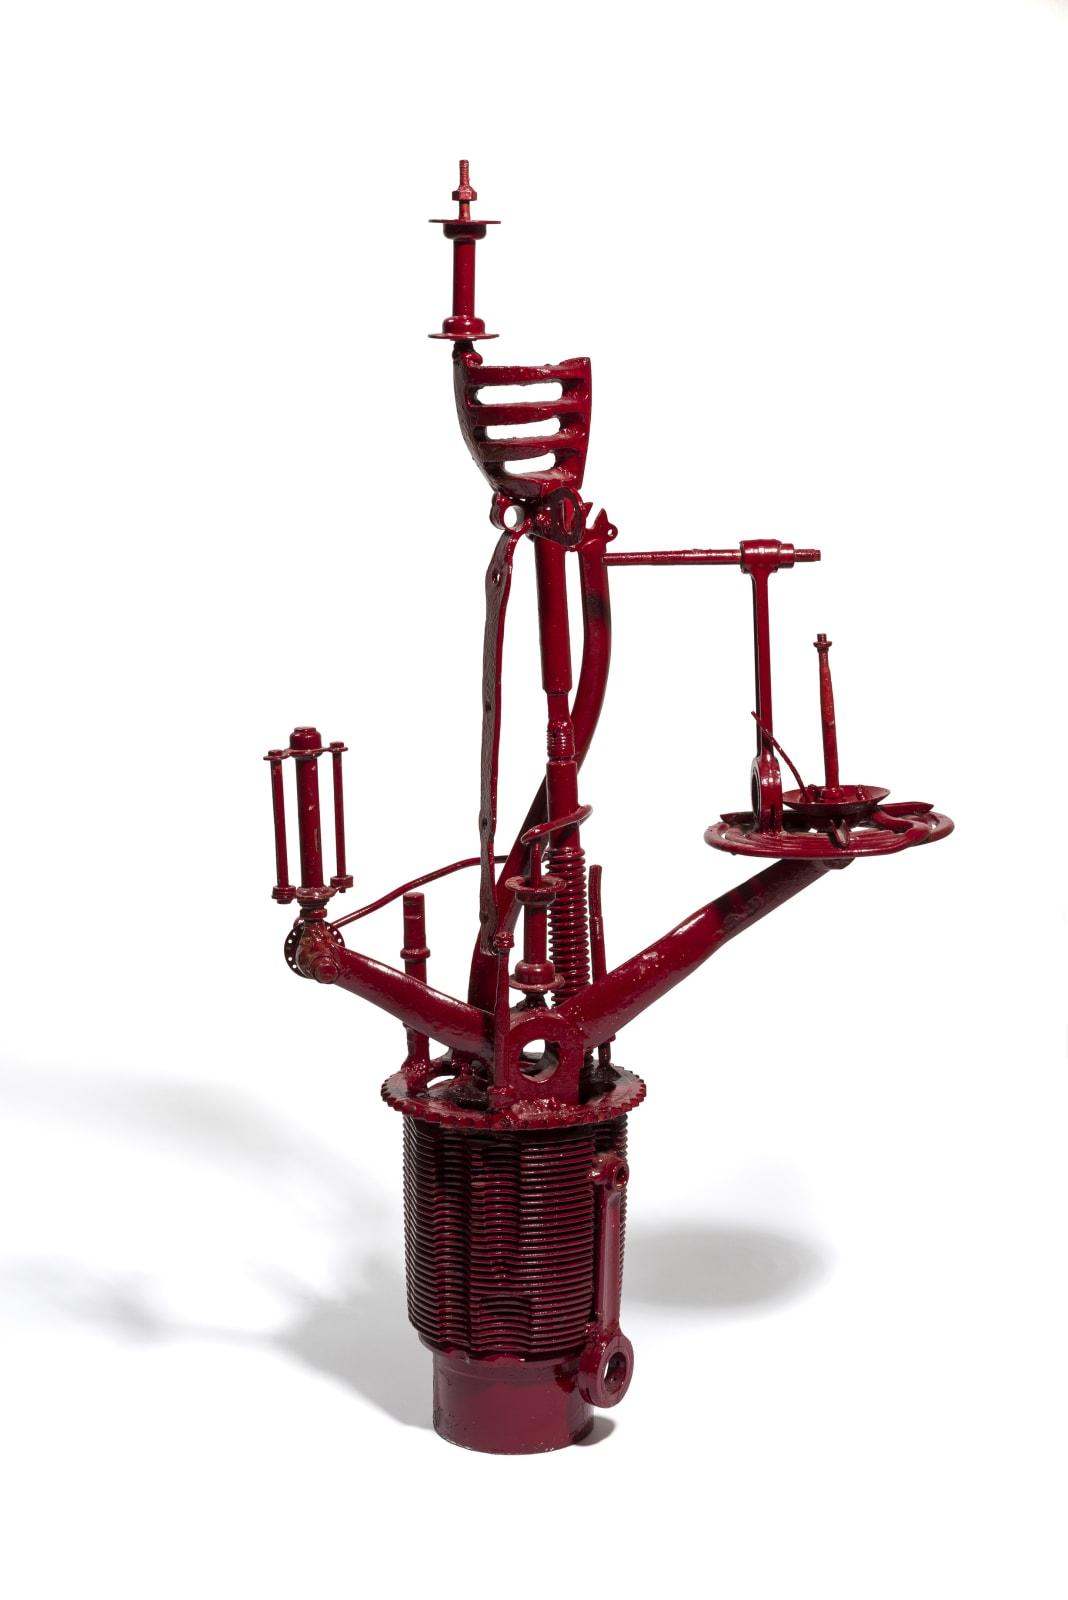 STANO FILKO, Model of Observation Tower - Red, 1966 - 1967